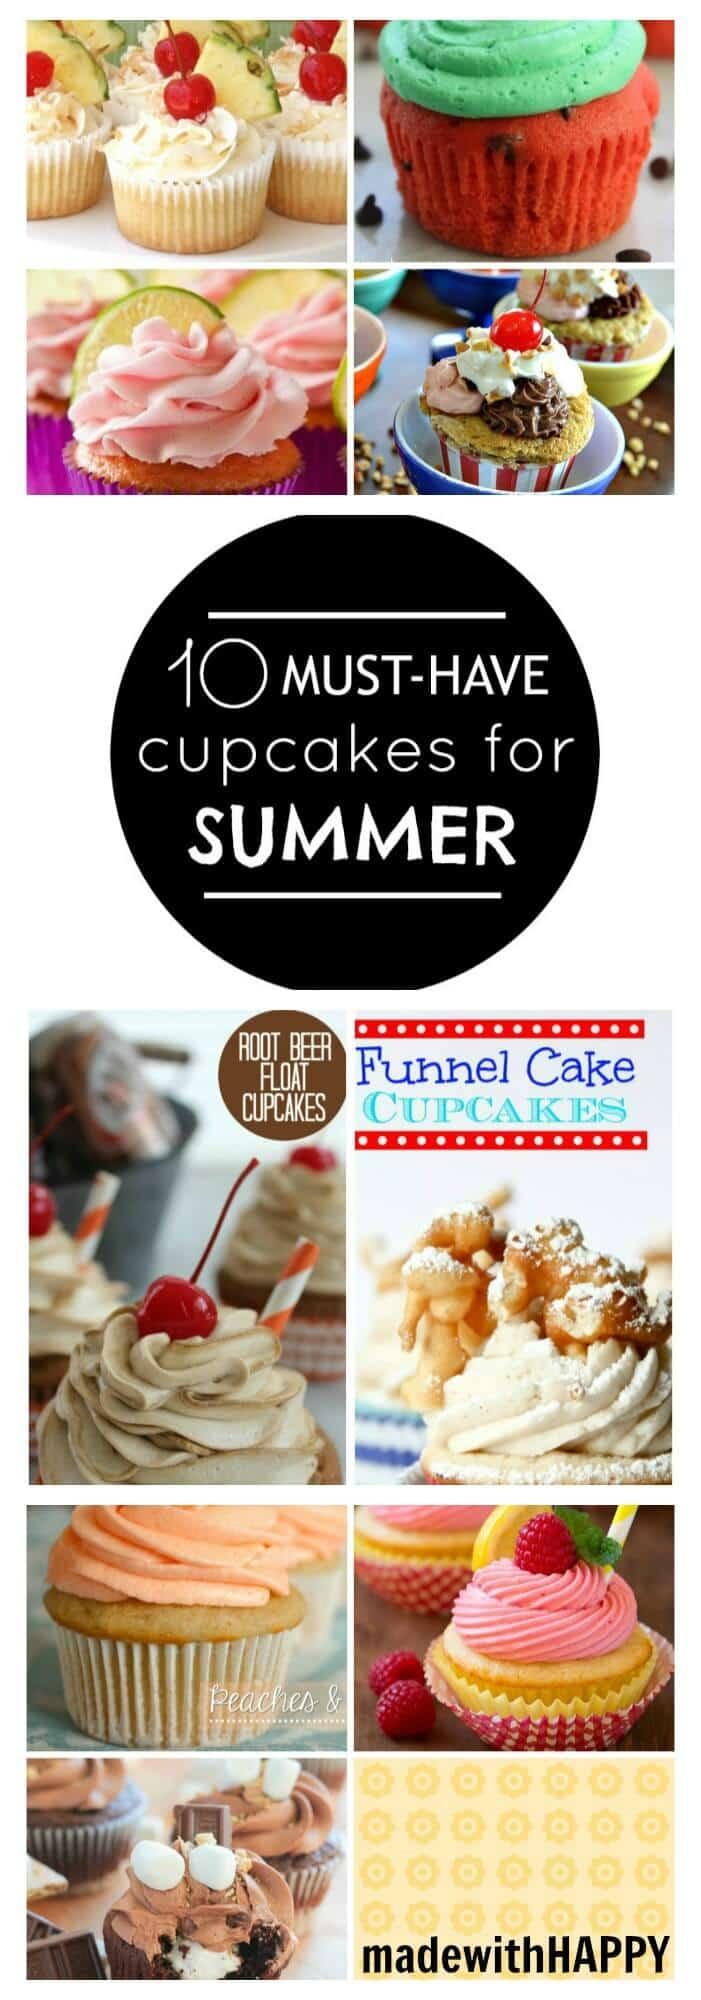 10 Must Have Cupcakes Recipes for Summer | Summer Cupcakes | Pina Colada Cupcake, Watermelon Cupcake, Funnel Cake Cupcake, Root beer Float Cupcake, Smores Cupcake, Strawberry Margarita Cupcake